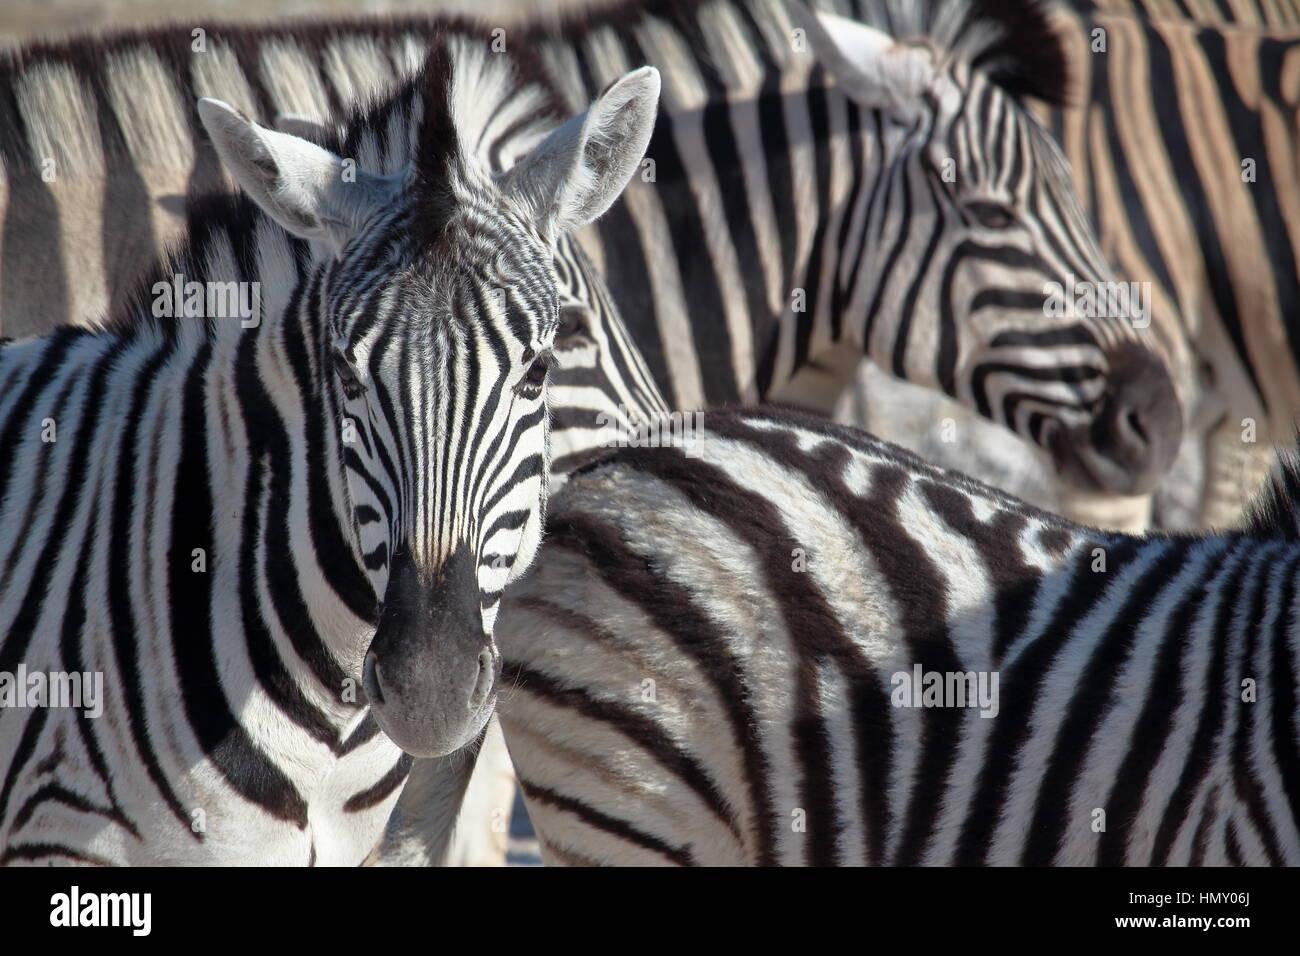 Zebra portrait in Etosha, Namibia - Stock Image